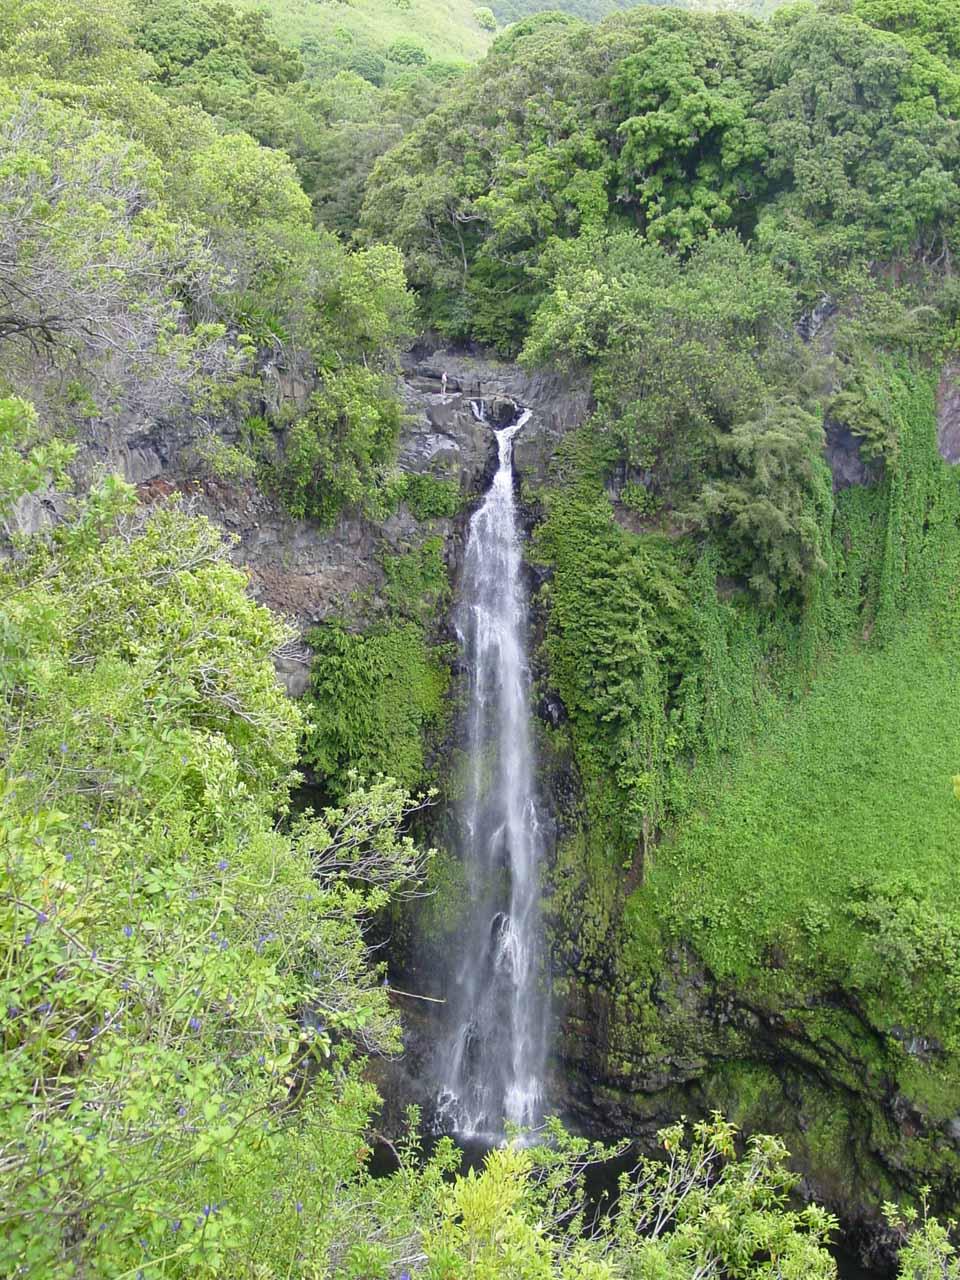 Makahiku Falls in moderate flow